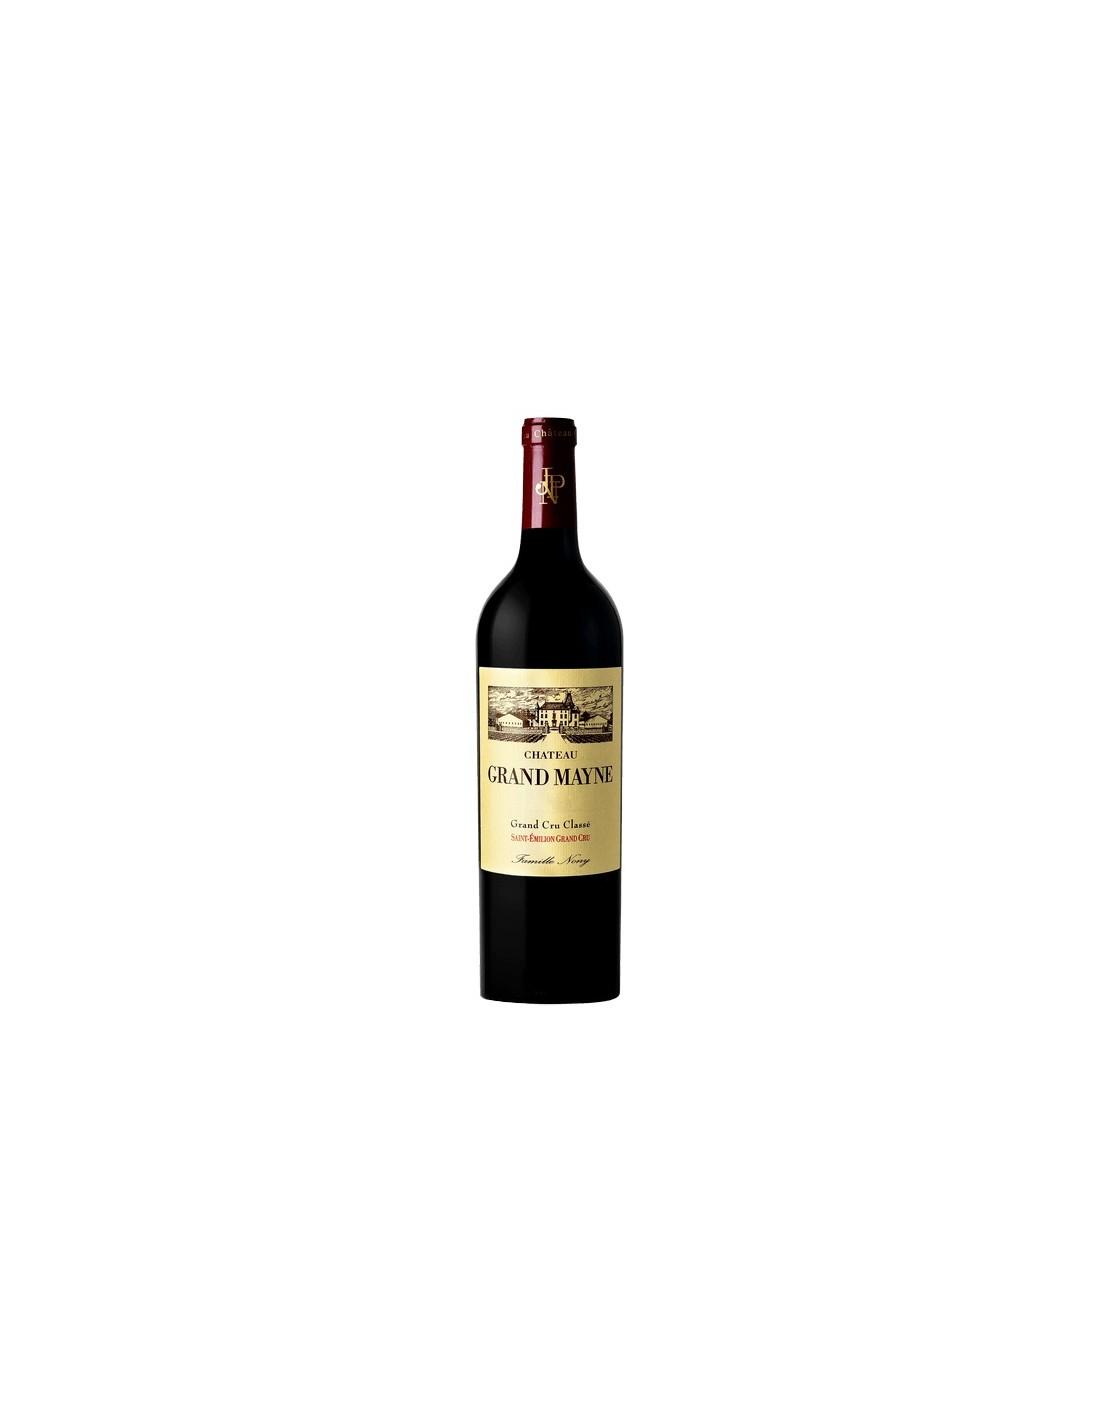 Vin rosu, Chateau Grand Mayne Saint-Emilion, 0.75L, 14.5% alc., Franta